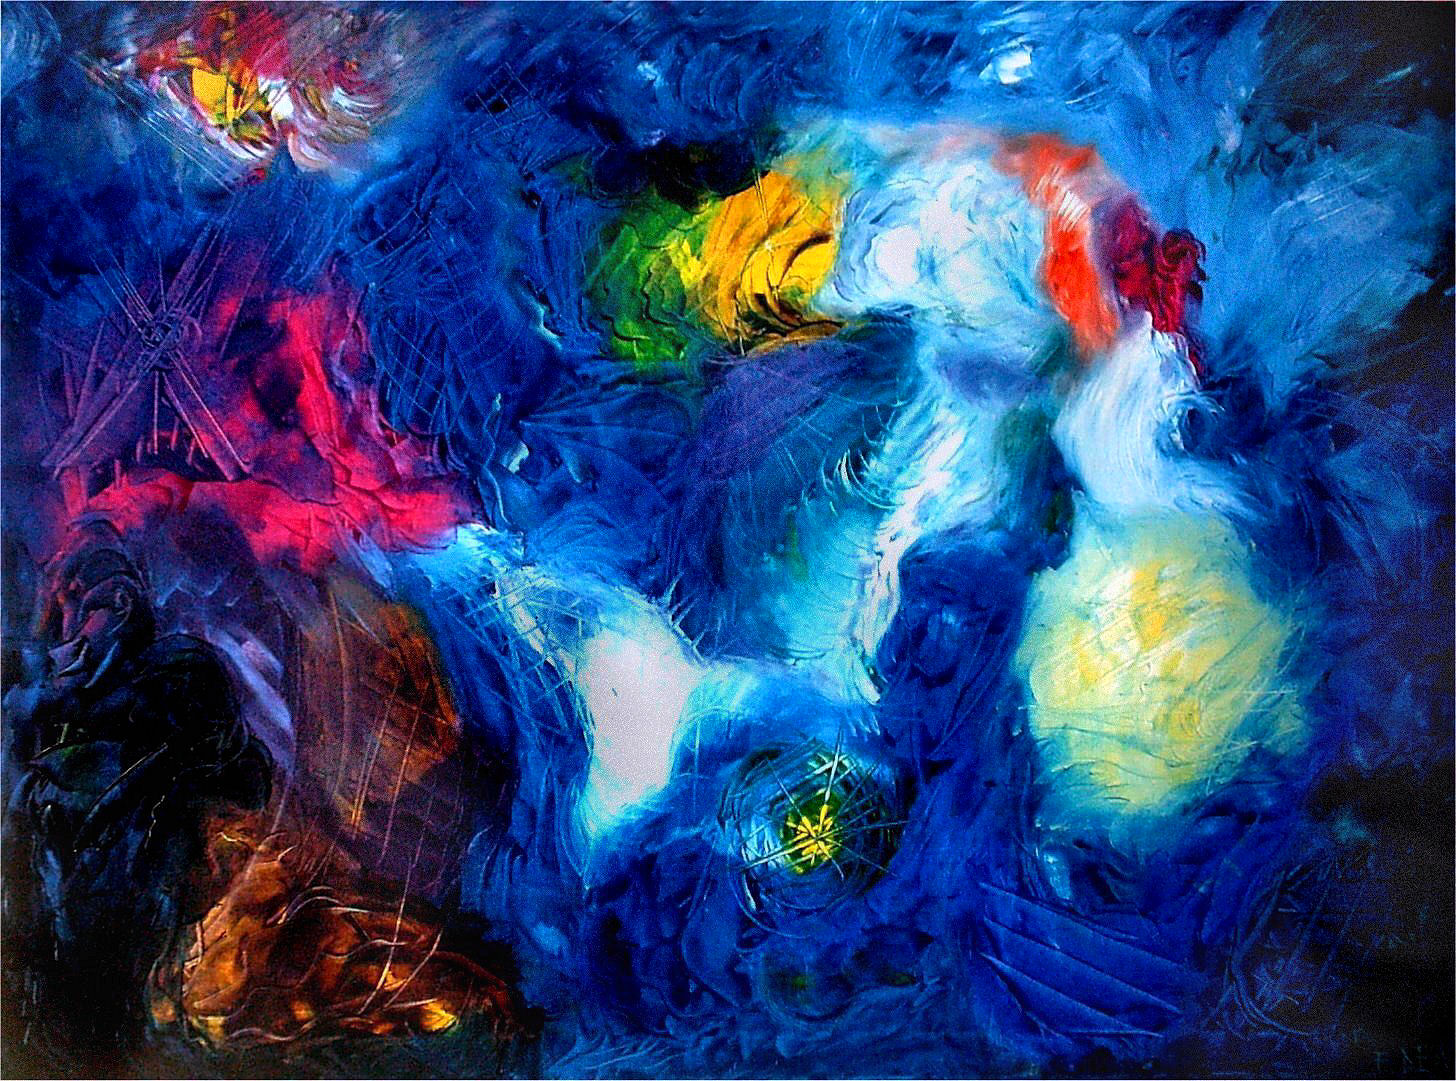 Quadro in olio su tela di Francesco Dea